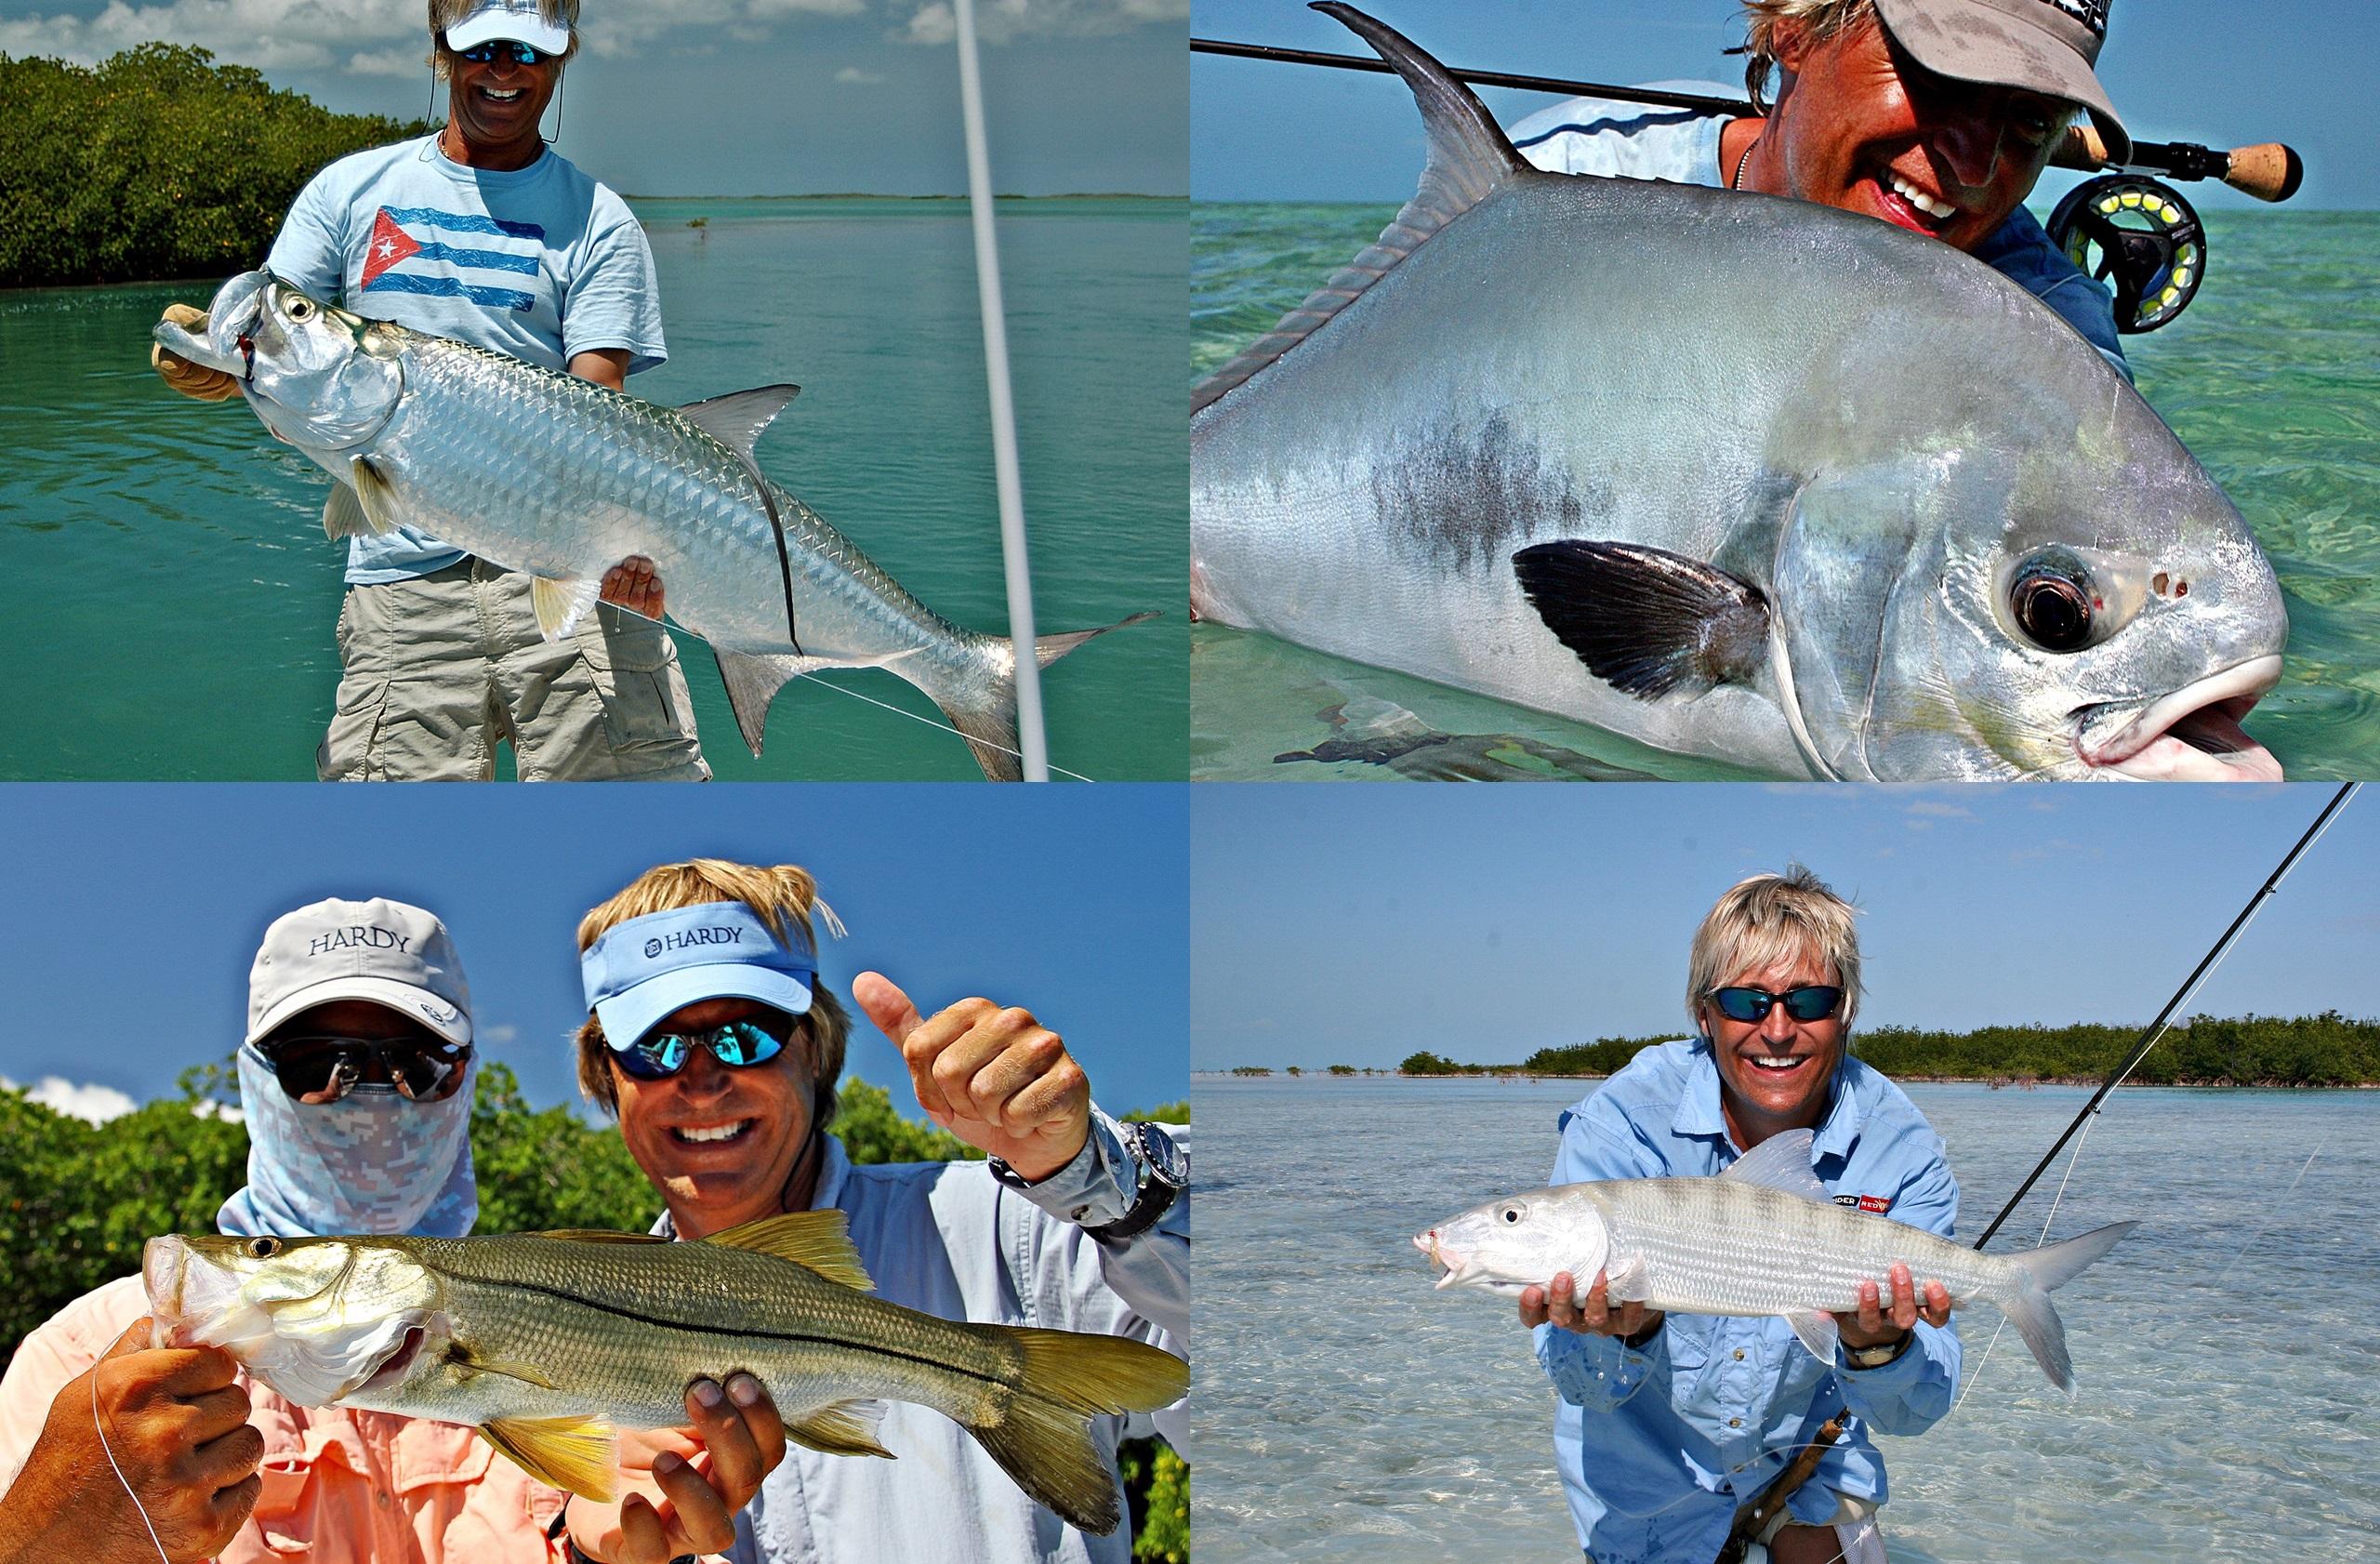 De 4 fiskene som inngår i en super grand slam. ov tarpon-permit-snook og bonefish